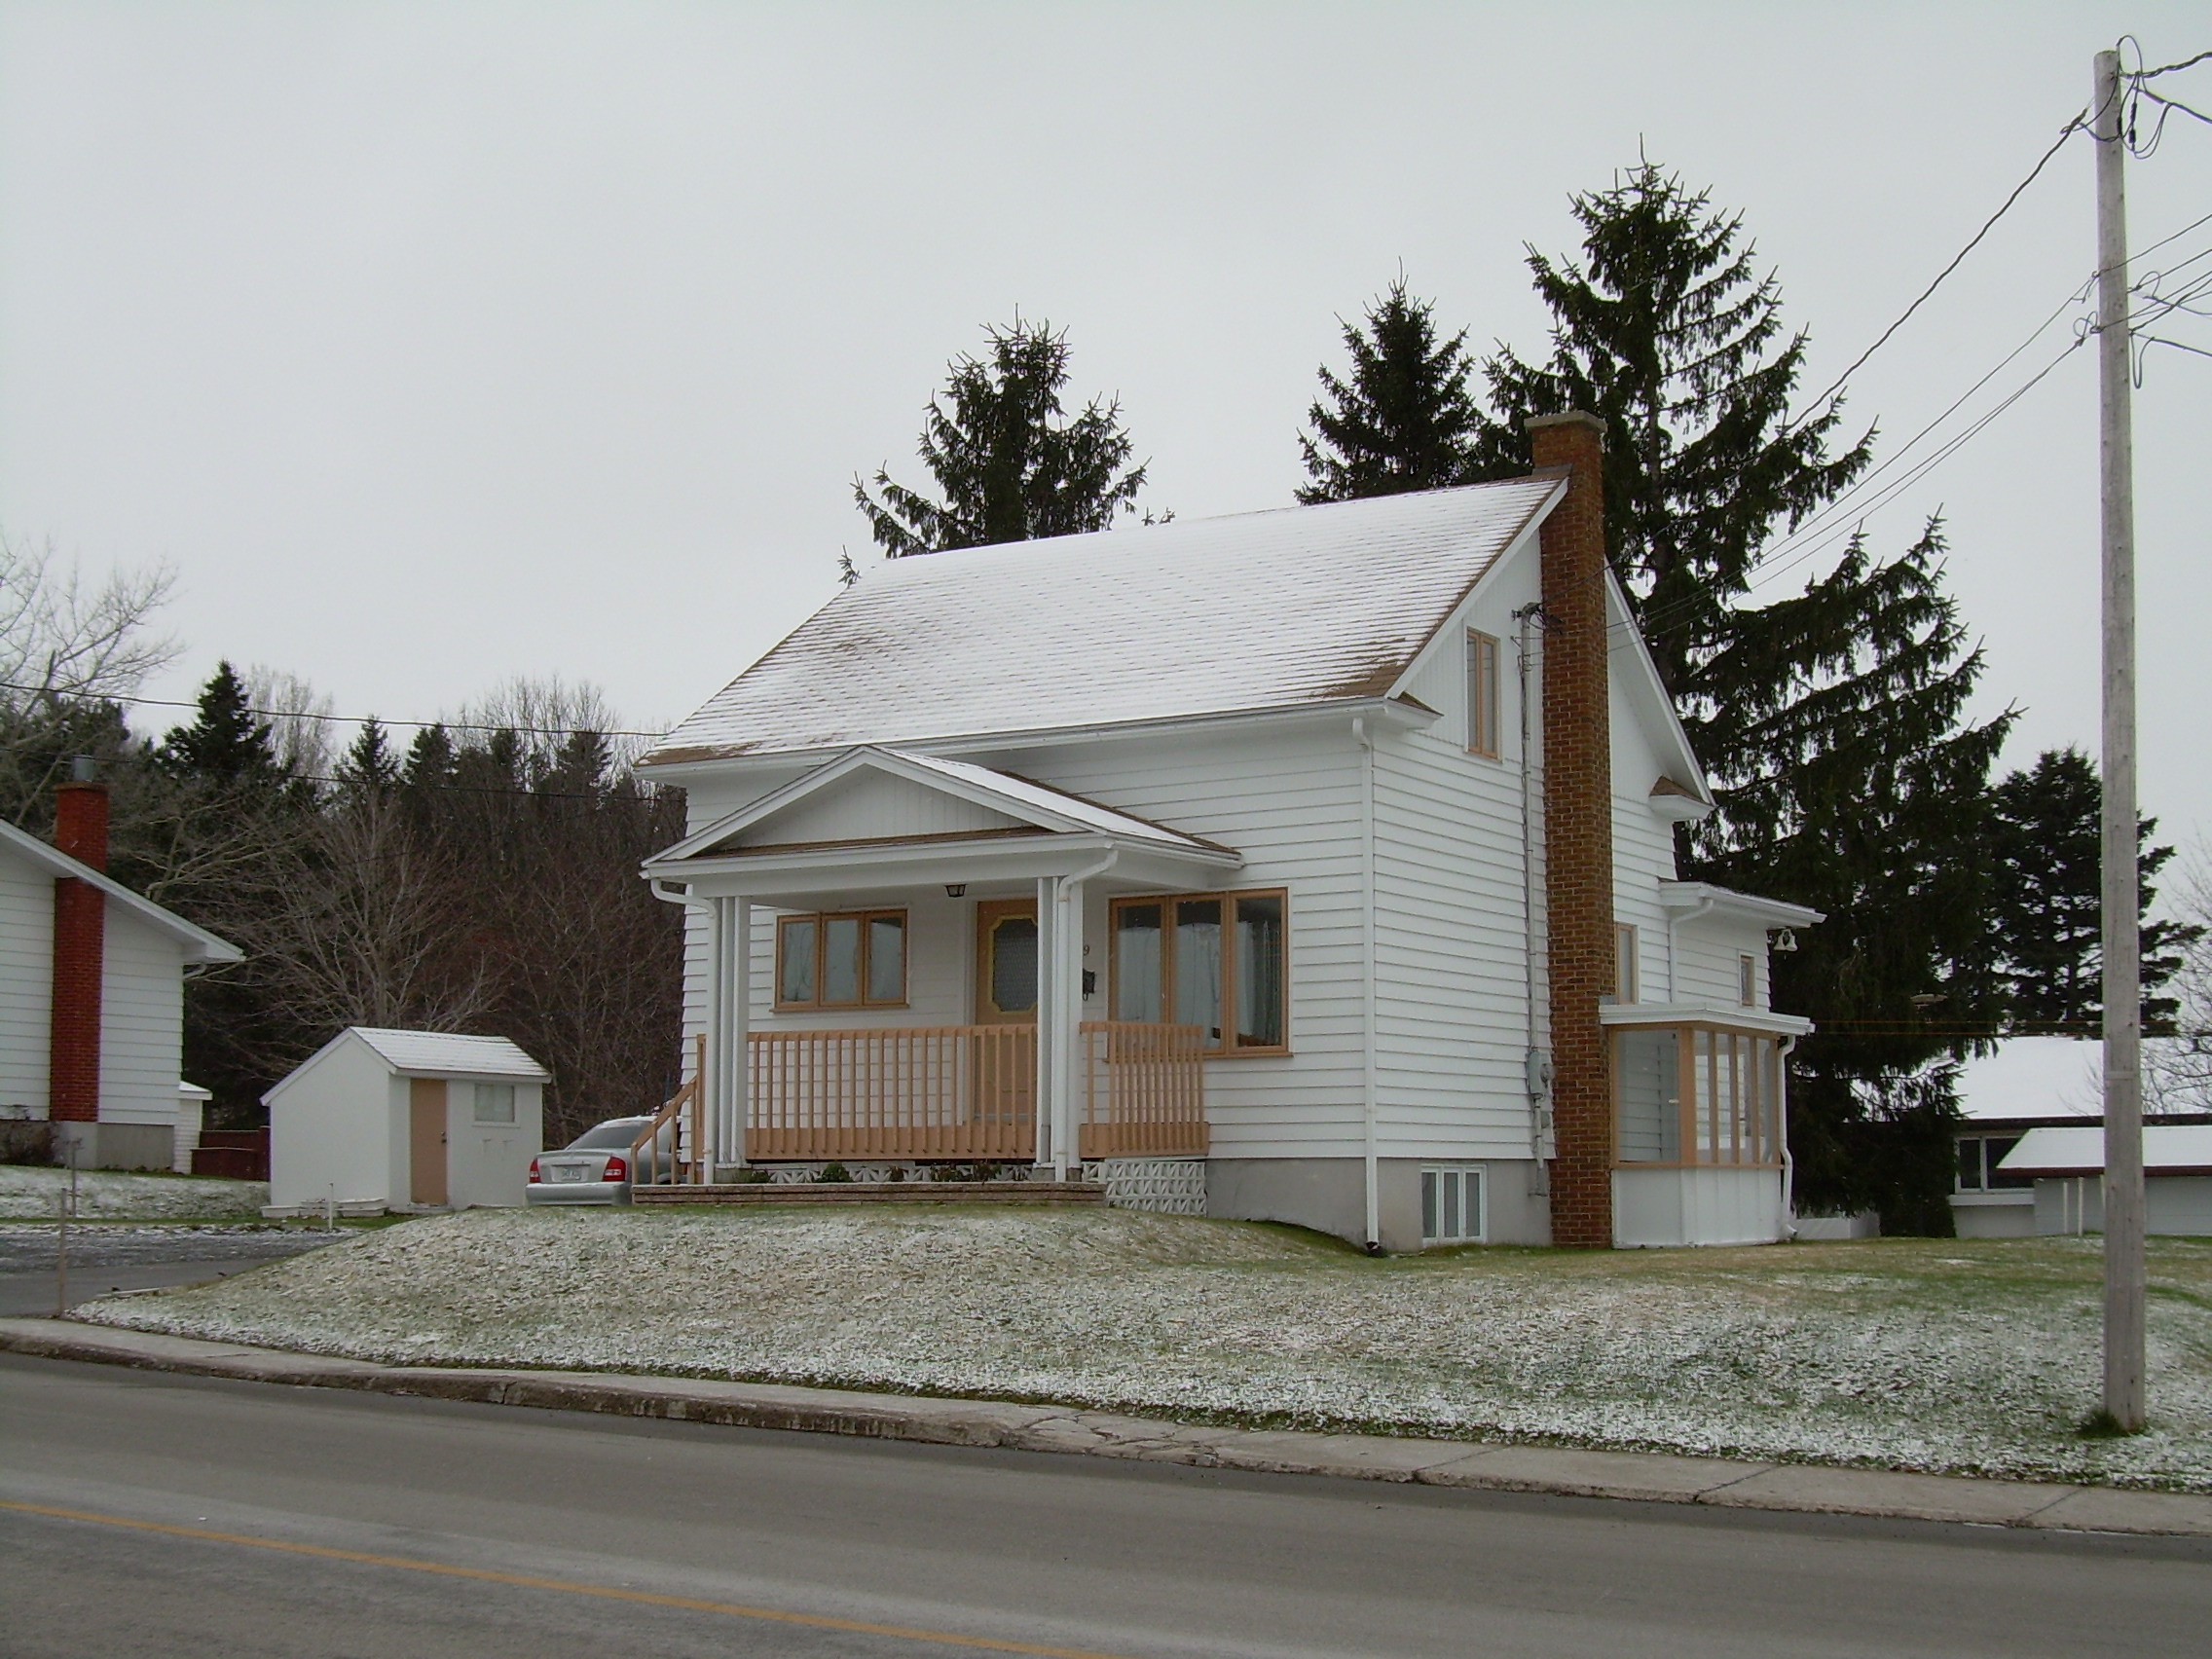 1206 - 369, avenue Rouleau